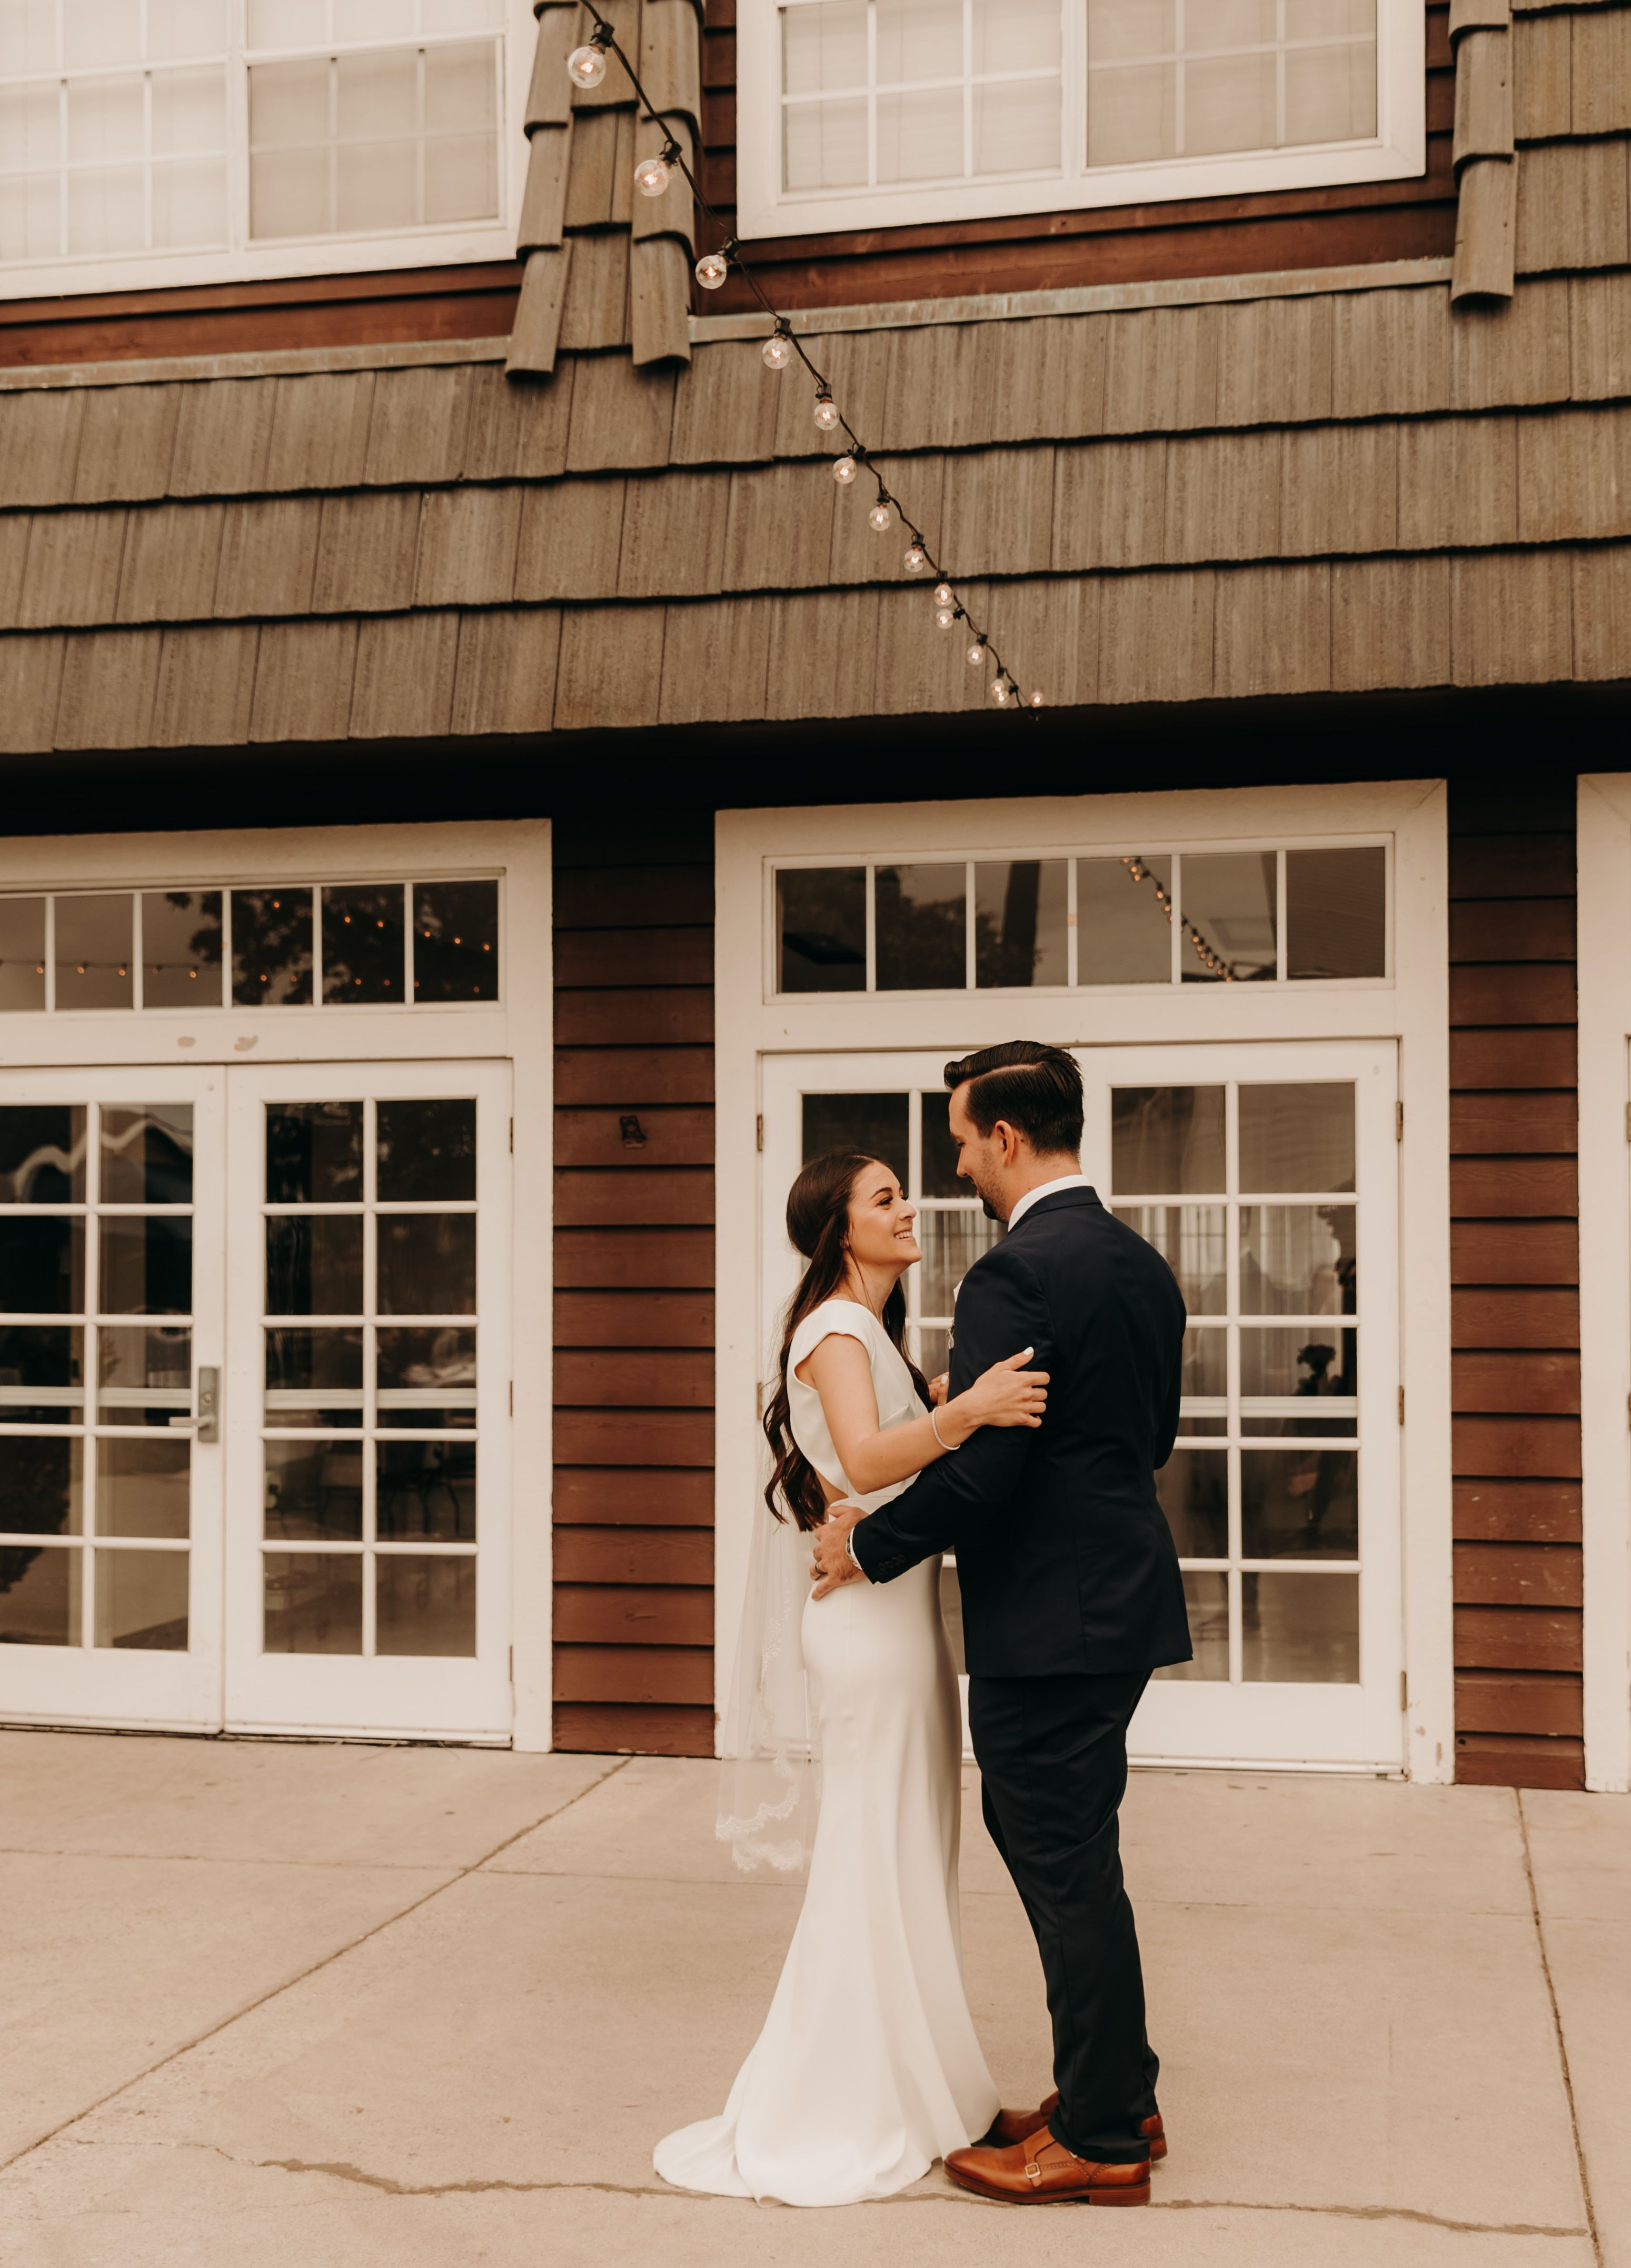 Newland Barn wedding- southern california outdoor wedd ...